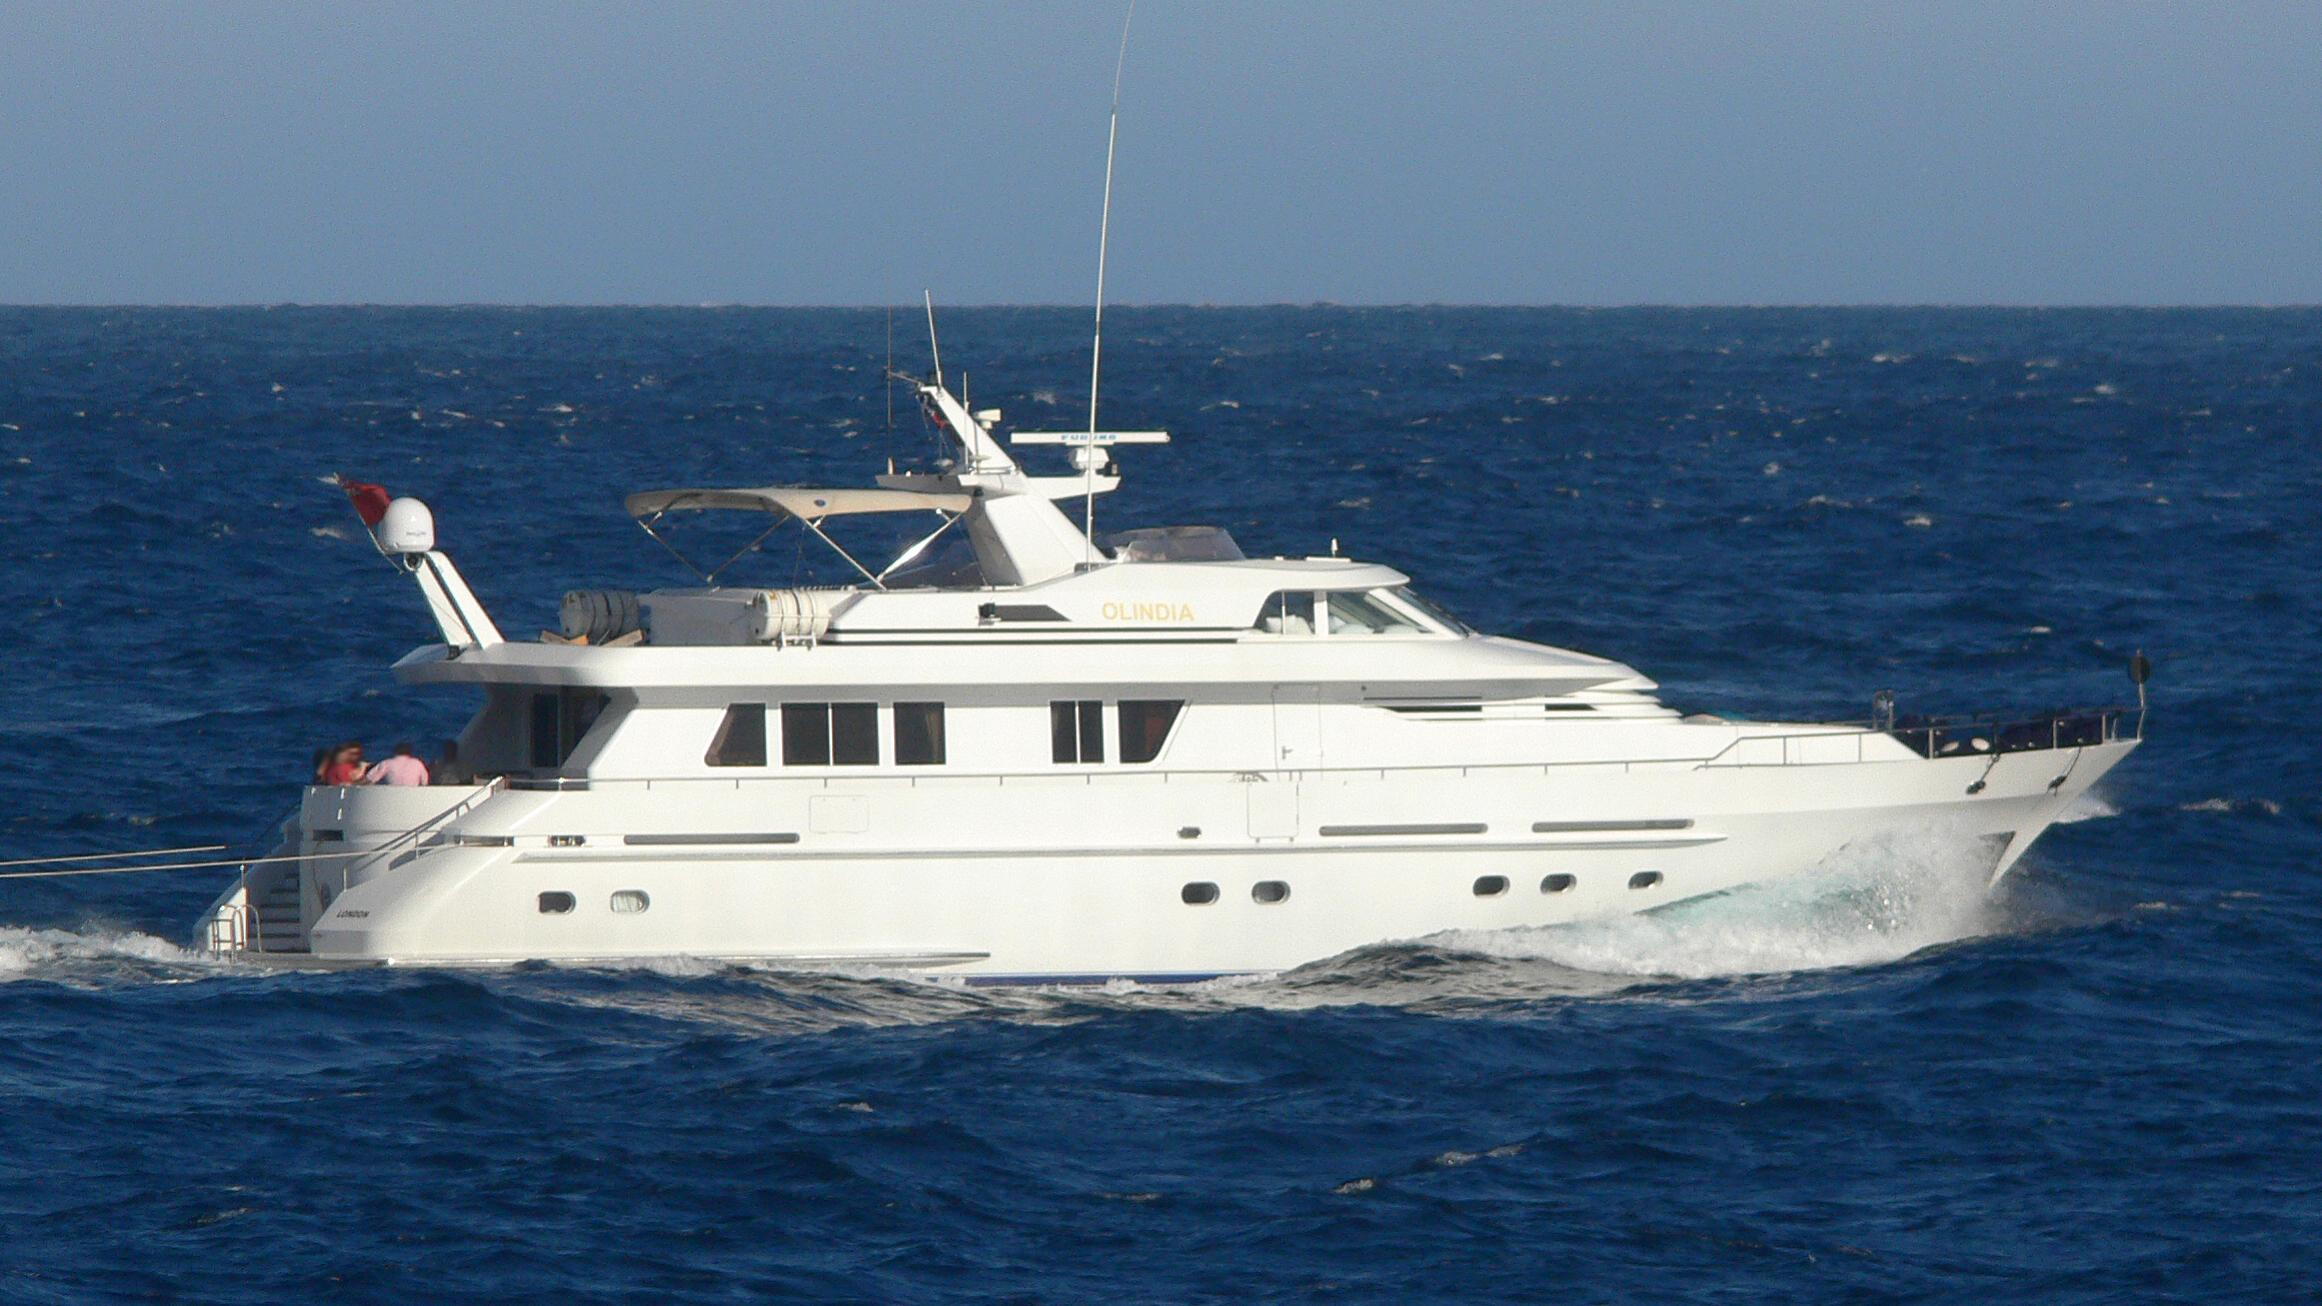 olindia-yacht-exterior